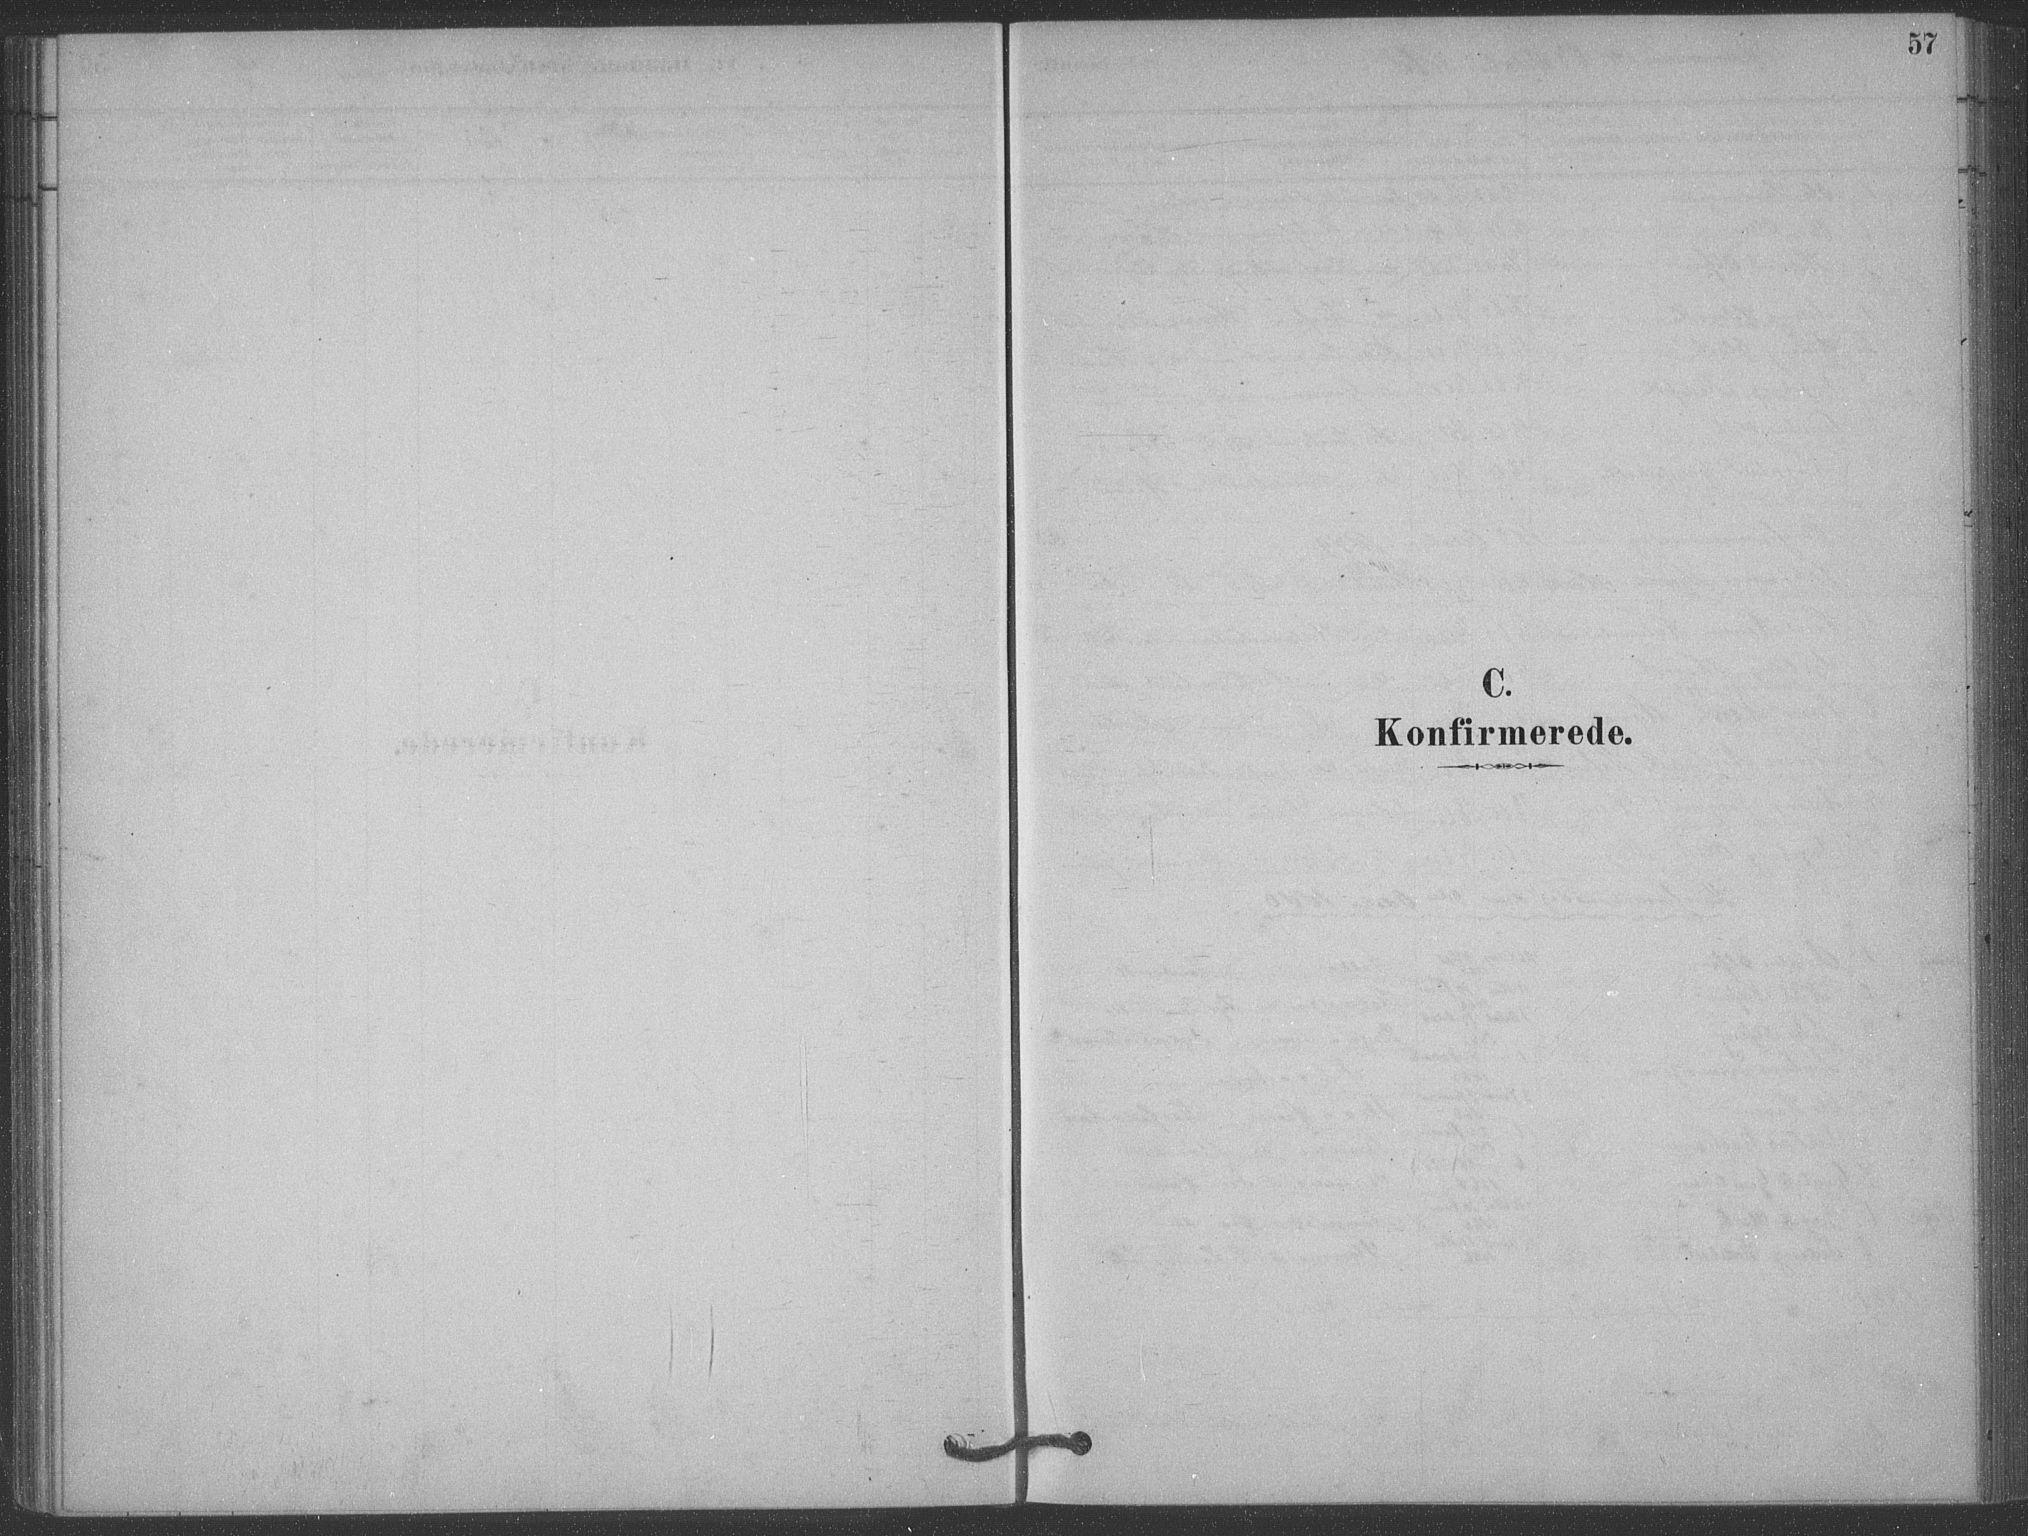 SAKO, Heddal kirkebøker, F/Fb/L0002: Ministerialbok nr. II 2, 1878-1913, s. 57